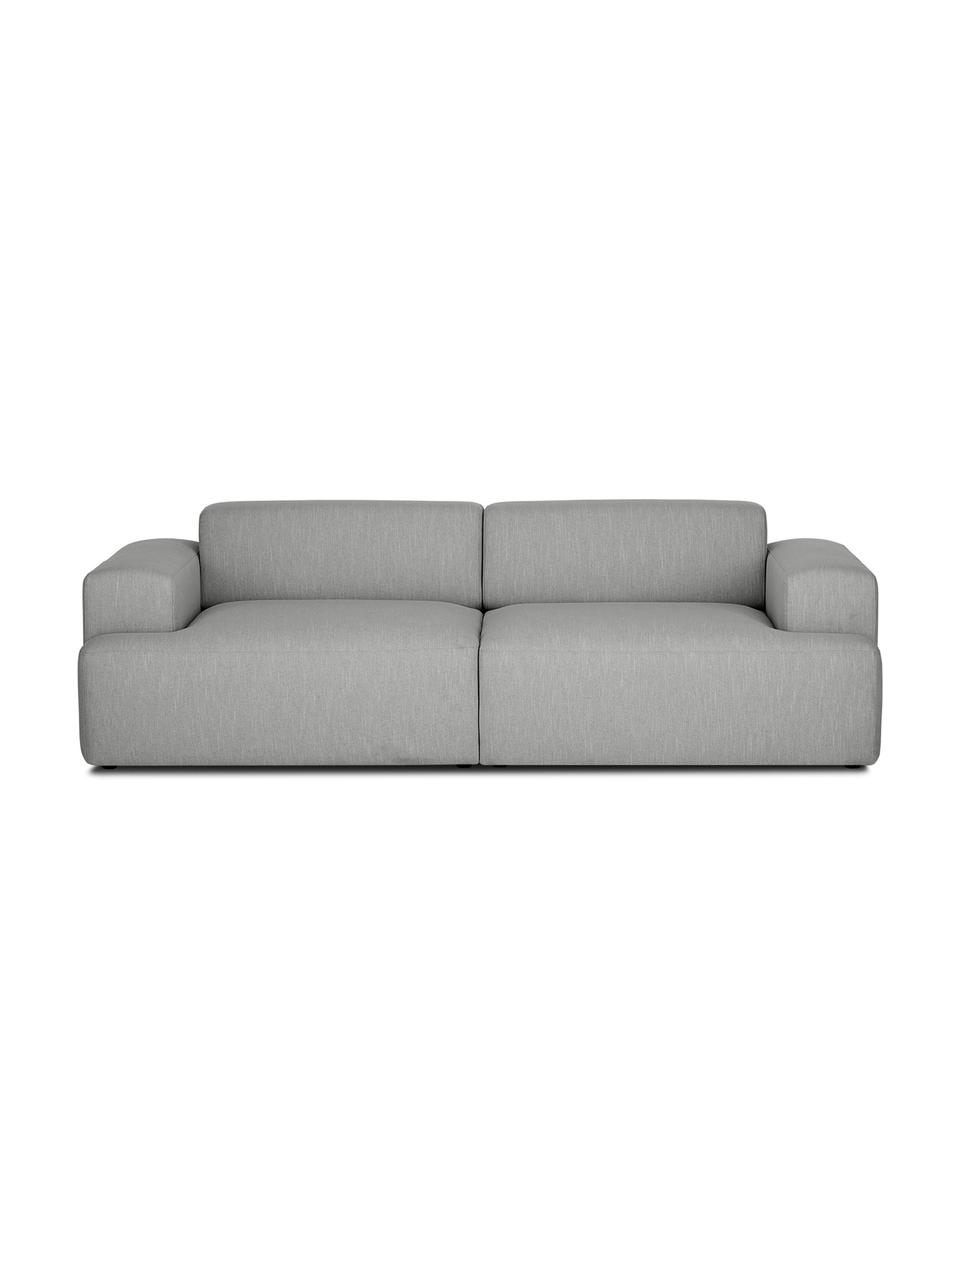 Sofa Melva (3-Sitzer) in Grau, Bezug: Polyester Der hochwertige, Gestell: Massives Kiefernholz, Spa, Füße: Kiefernholz Die Füße befi, Webstoff Grau, B 240 x T 101 cm